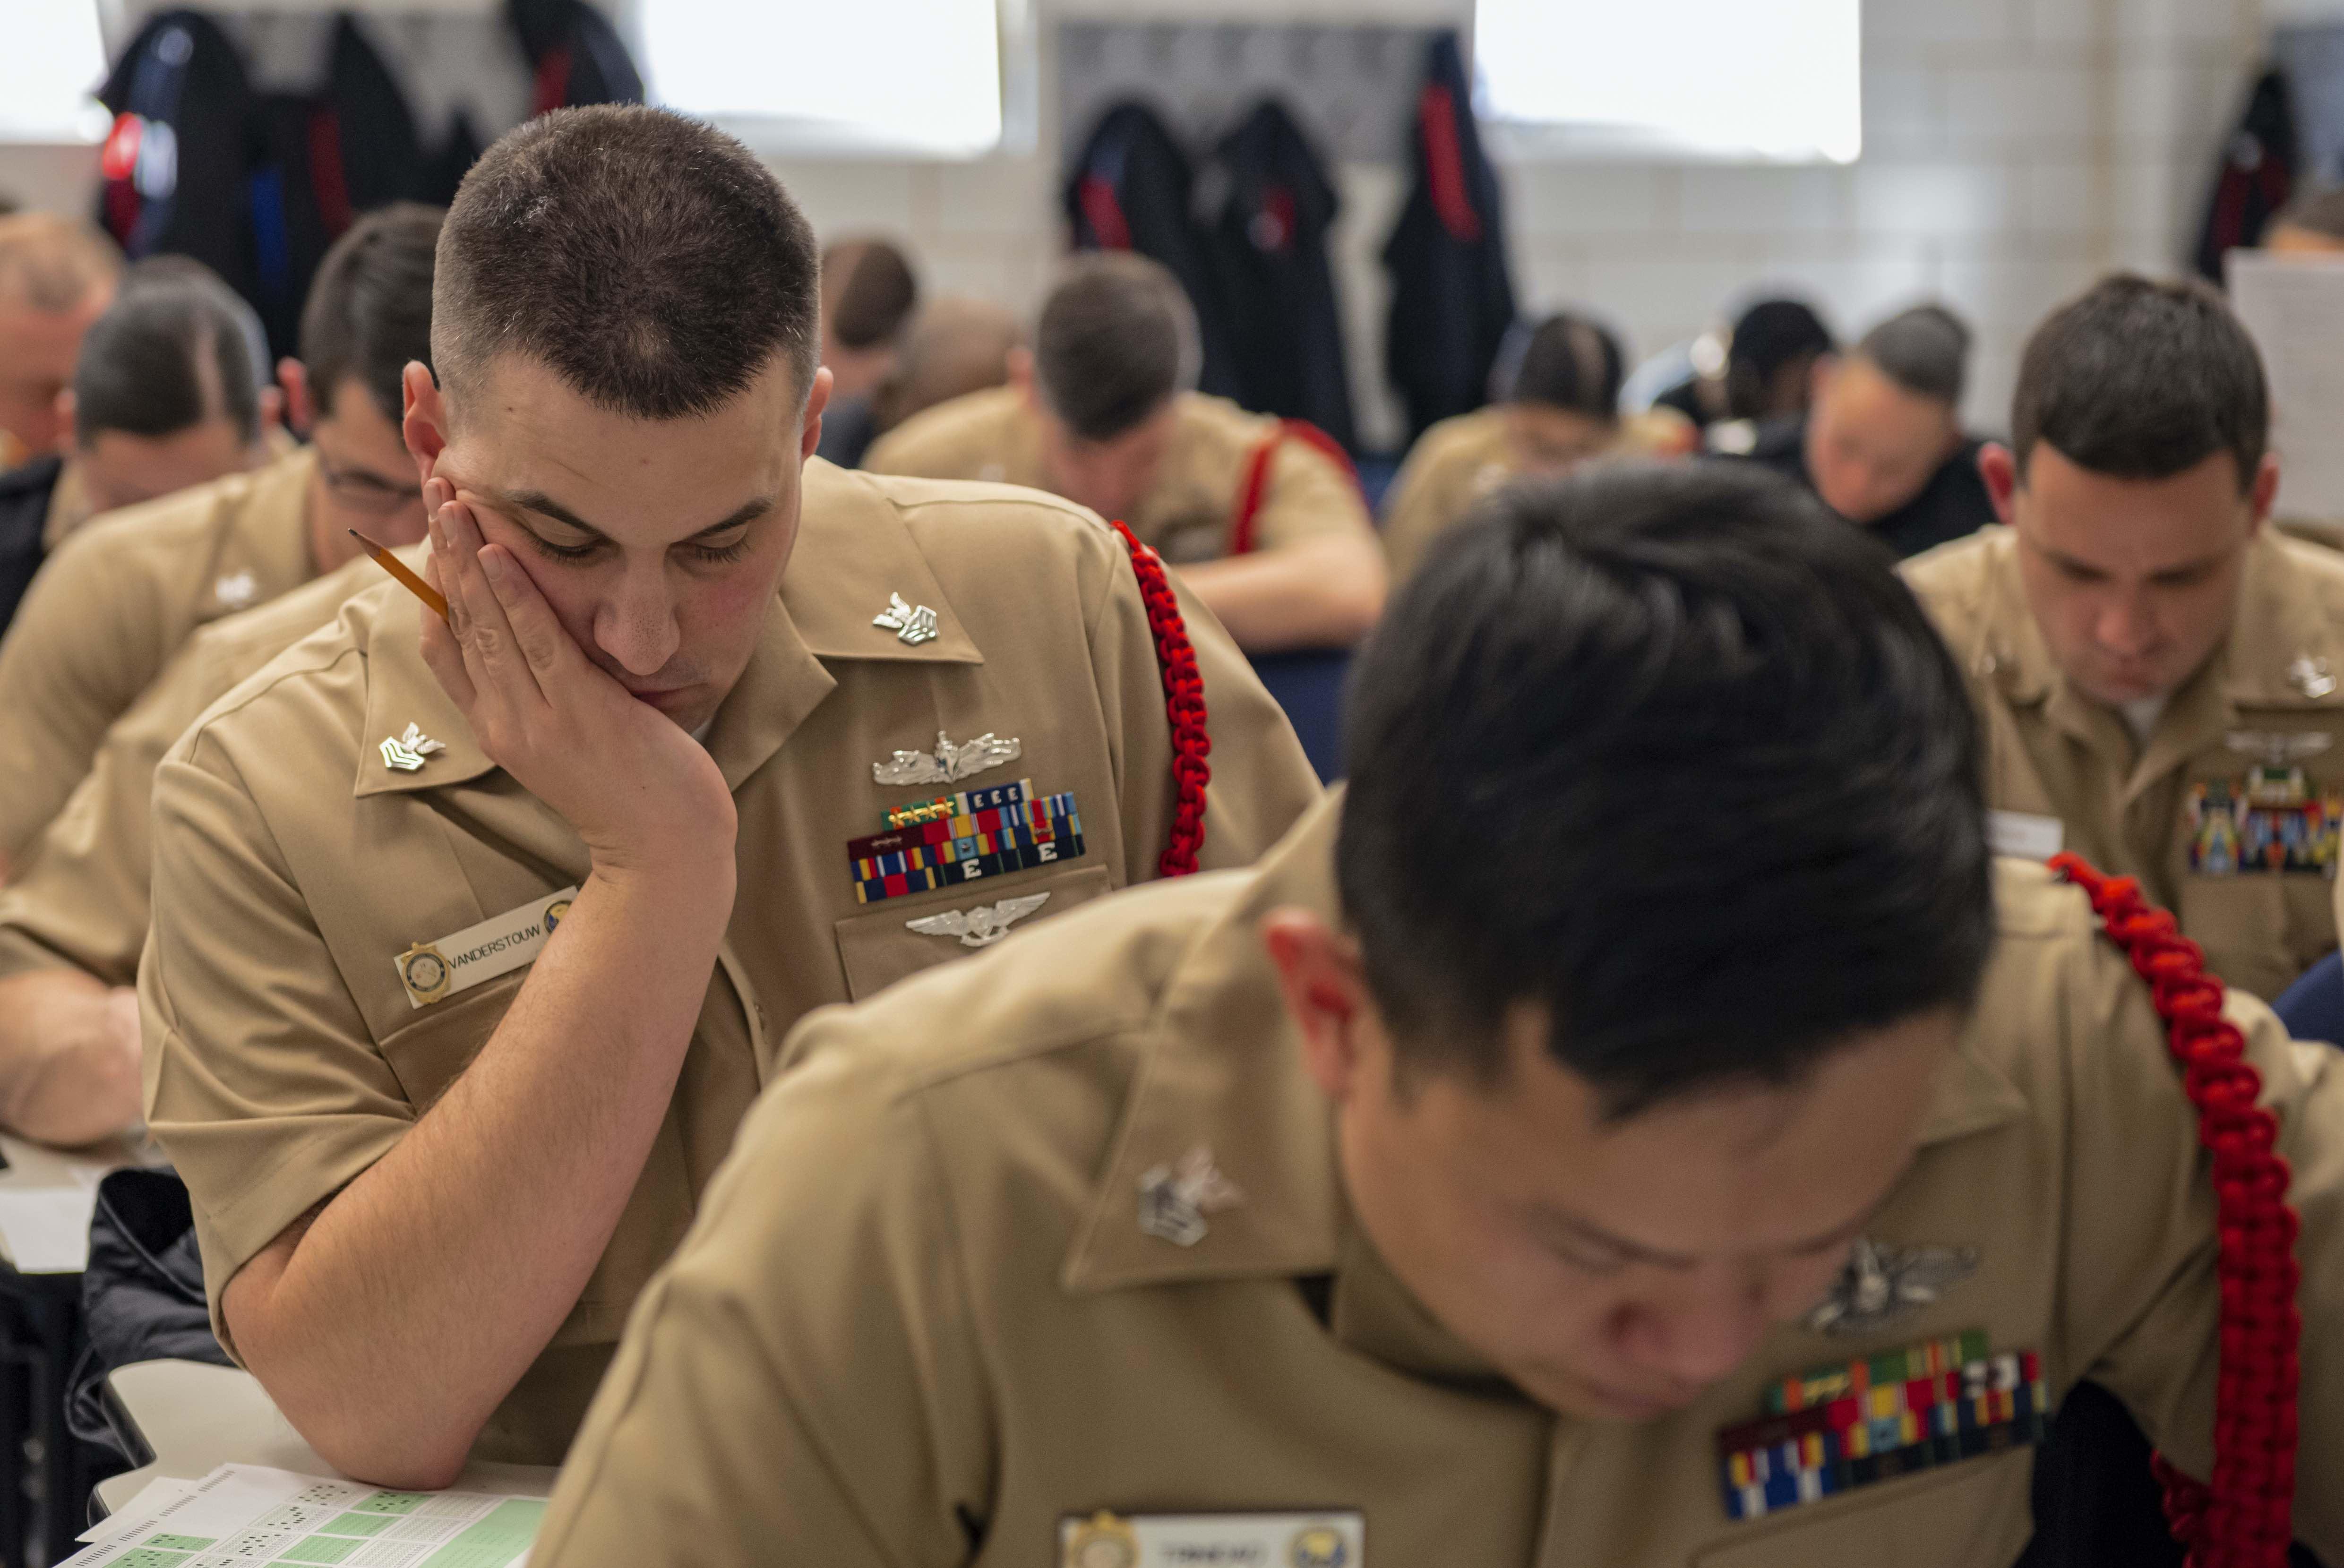 Naval Community College Kicks Off January 2021 With IT, Engineering Majors - USNI News